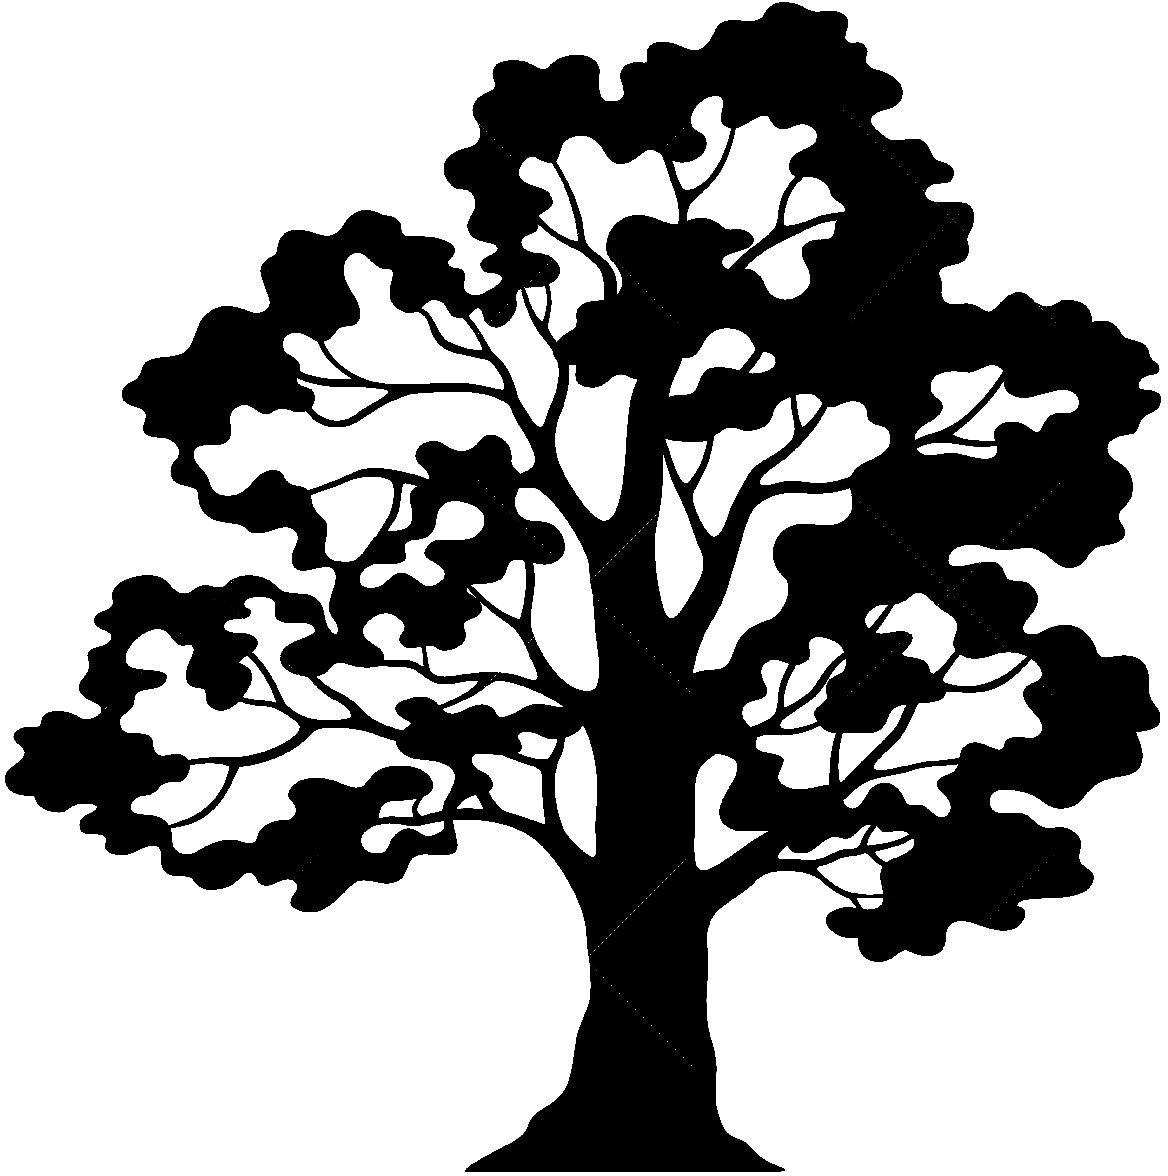 oak tree silhouette ornament 10 trees pinterest silhouetten schablone und schatten. Black Bedroom Furniture Sets. Home Design Ideas